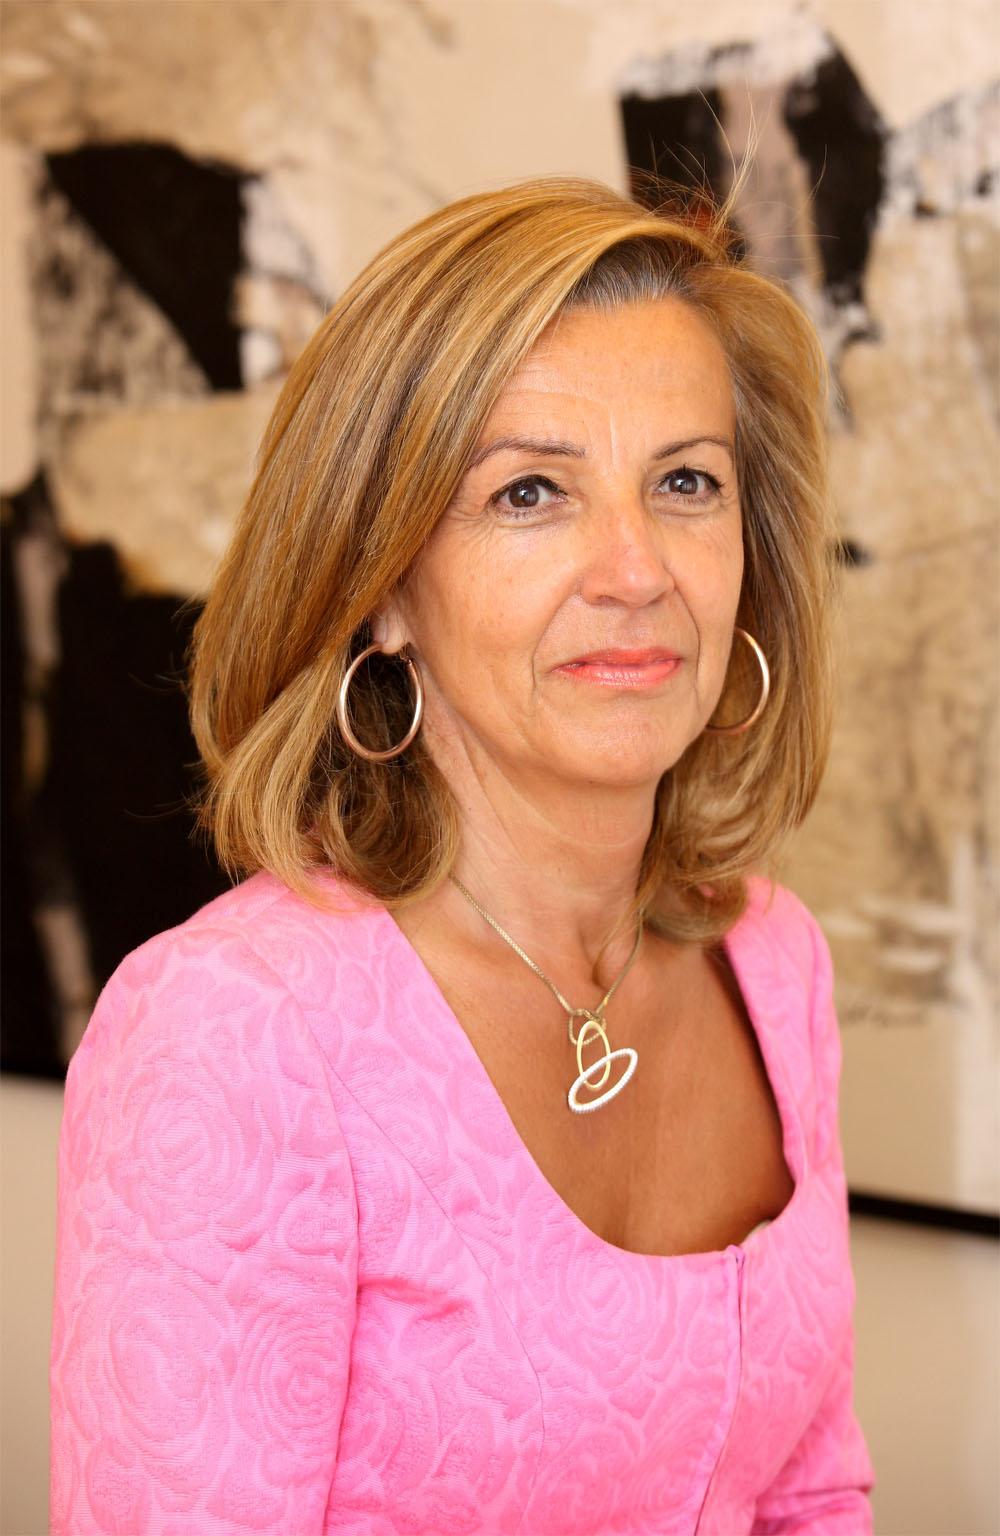 Carmen Gonzalez Poblet - carmen-gonzalez-poblet